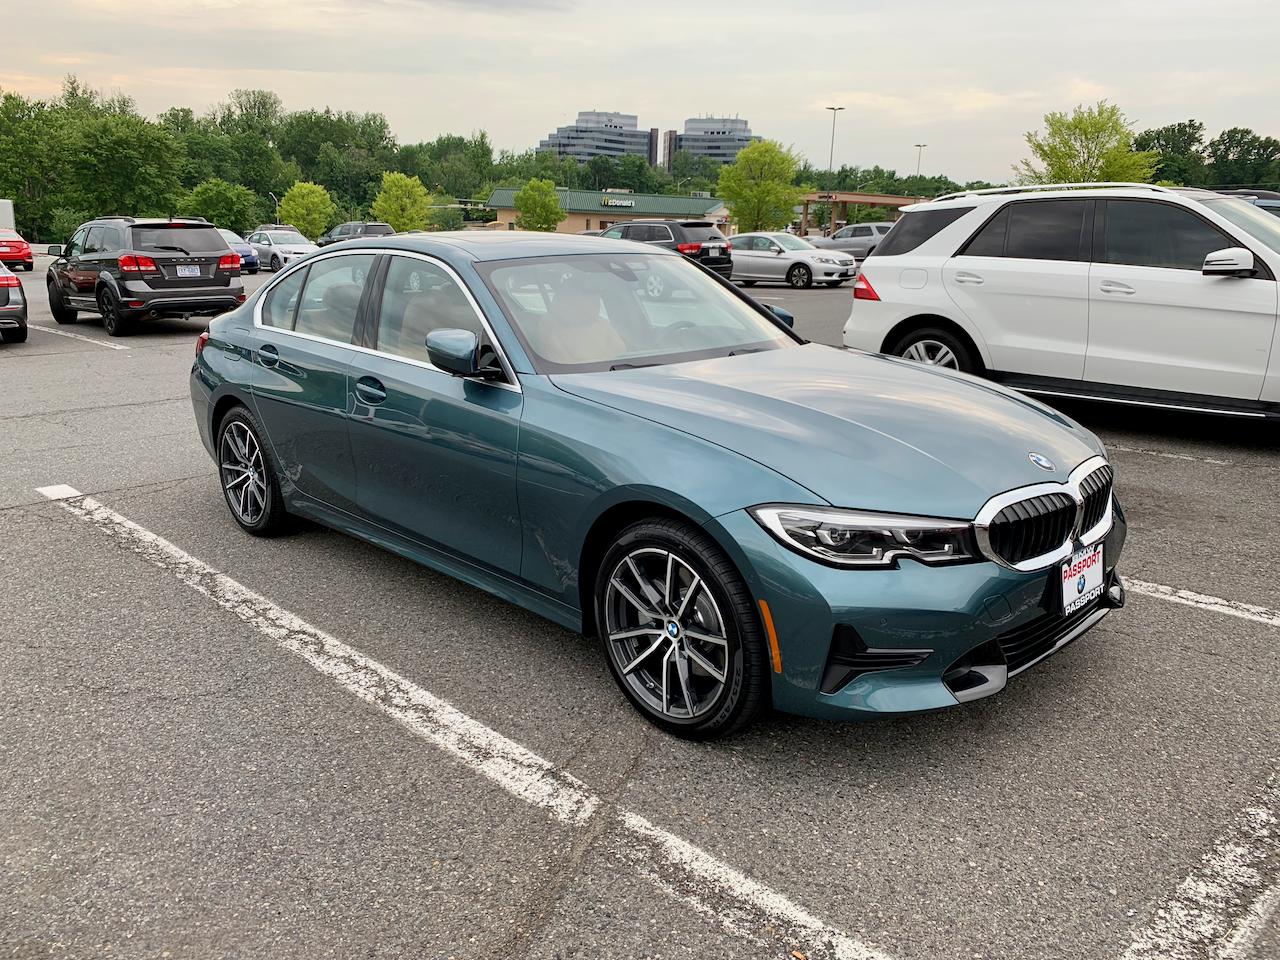 2018 - [BMW] Série 3 [G20/G21] - Page 32 10gk80l